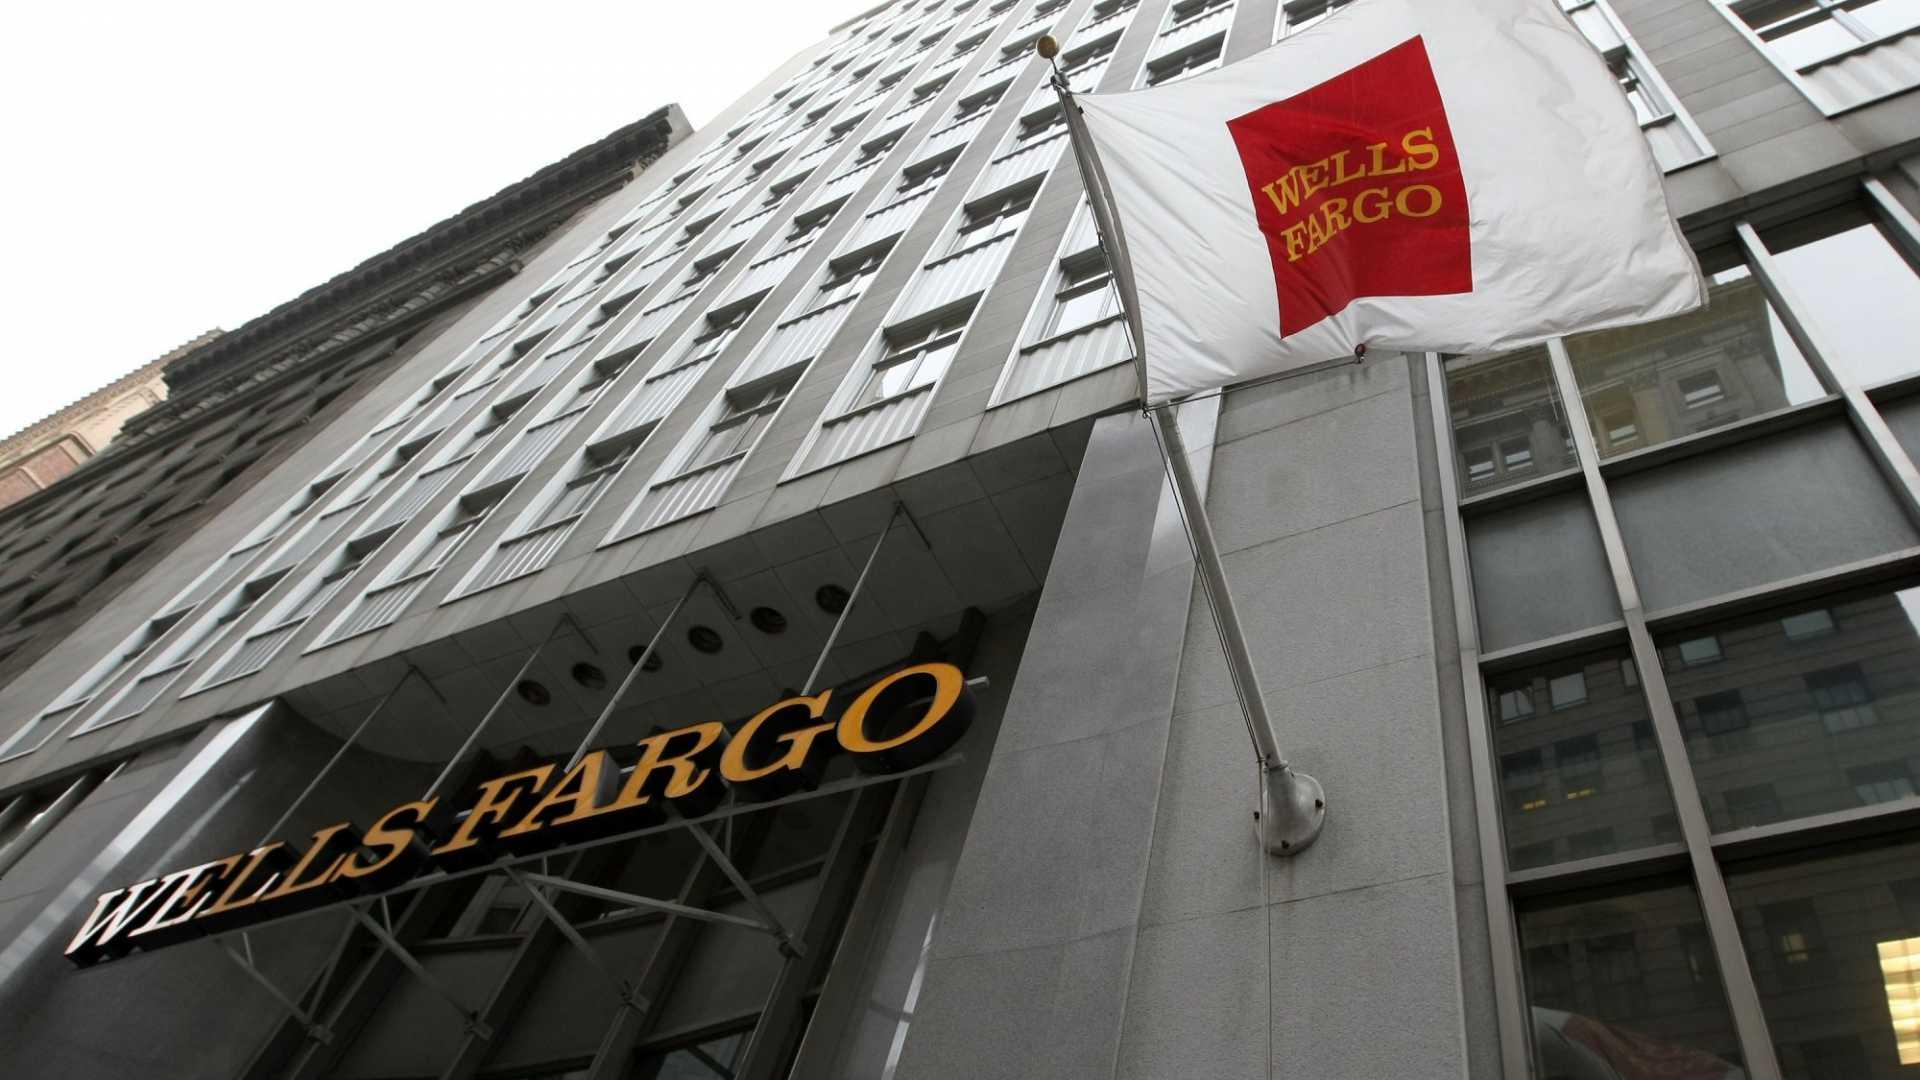 Fed Releases Wells Fargo From PPP Loan Cap